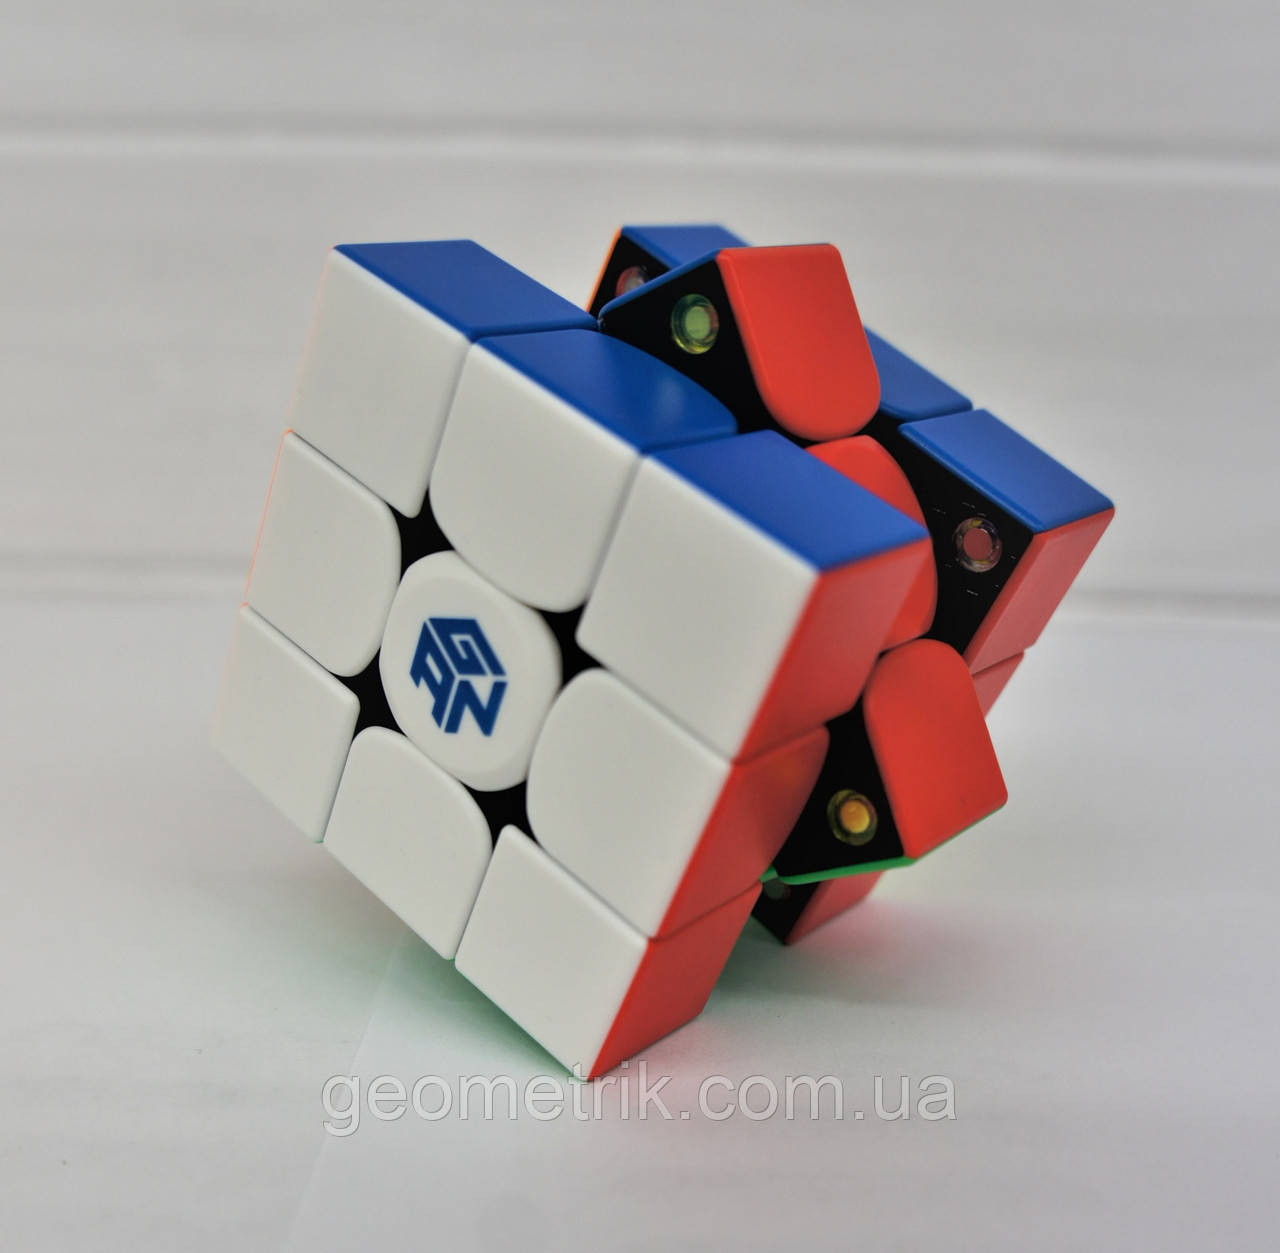 Кубик Рубика 3х3 GAN354 V2M IPG с доп. пружинами (без наклеек) арт. GAN354-1